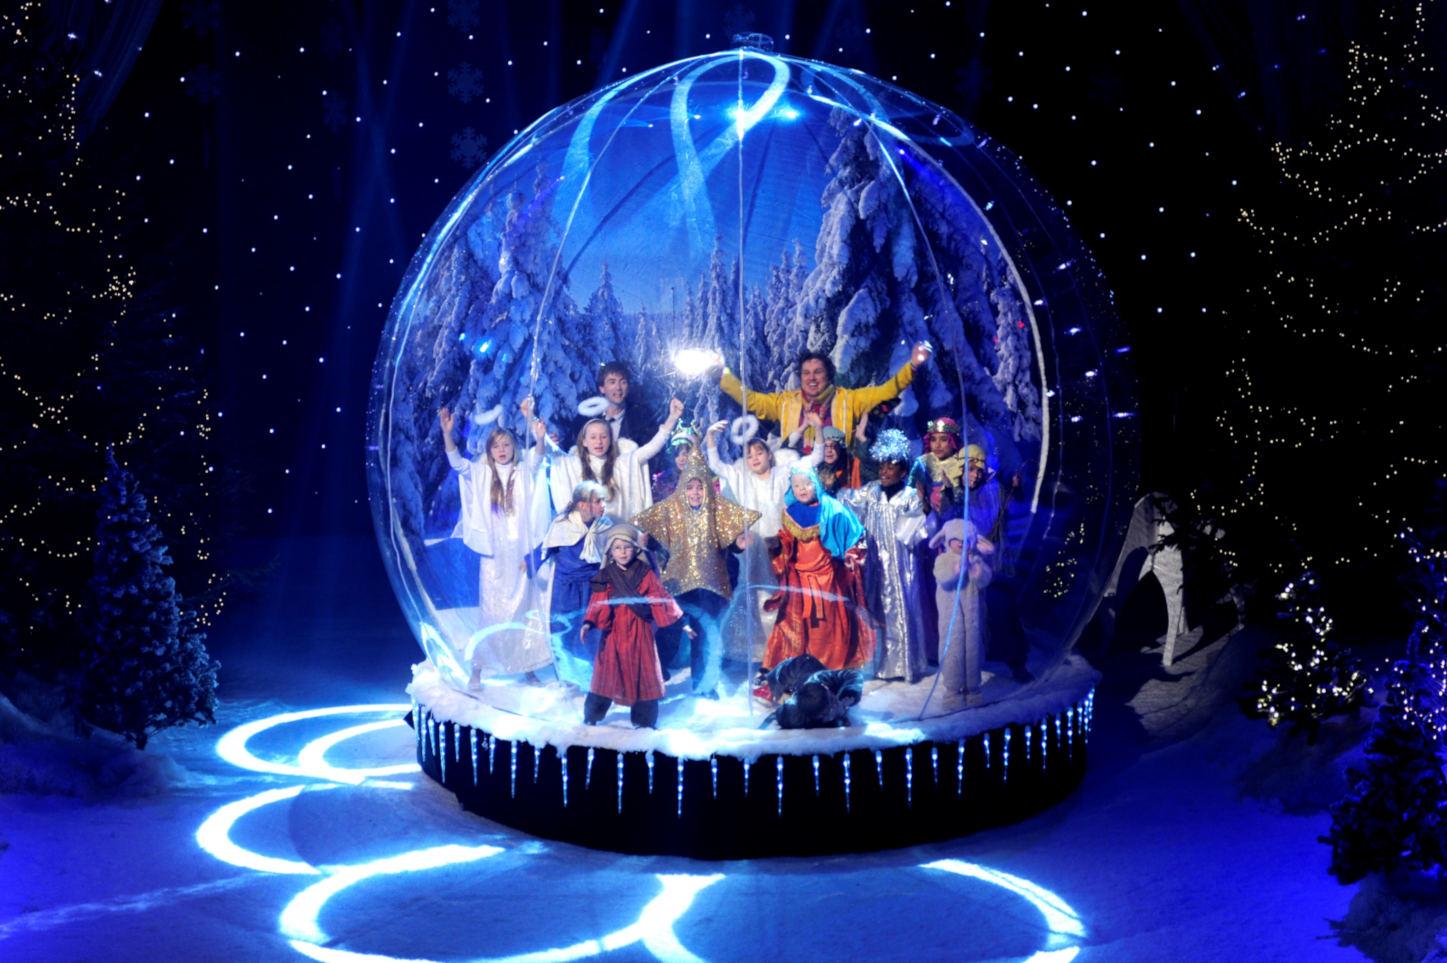 JBL Inflatable Snowglobe